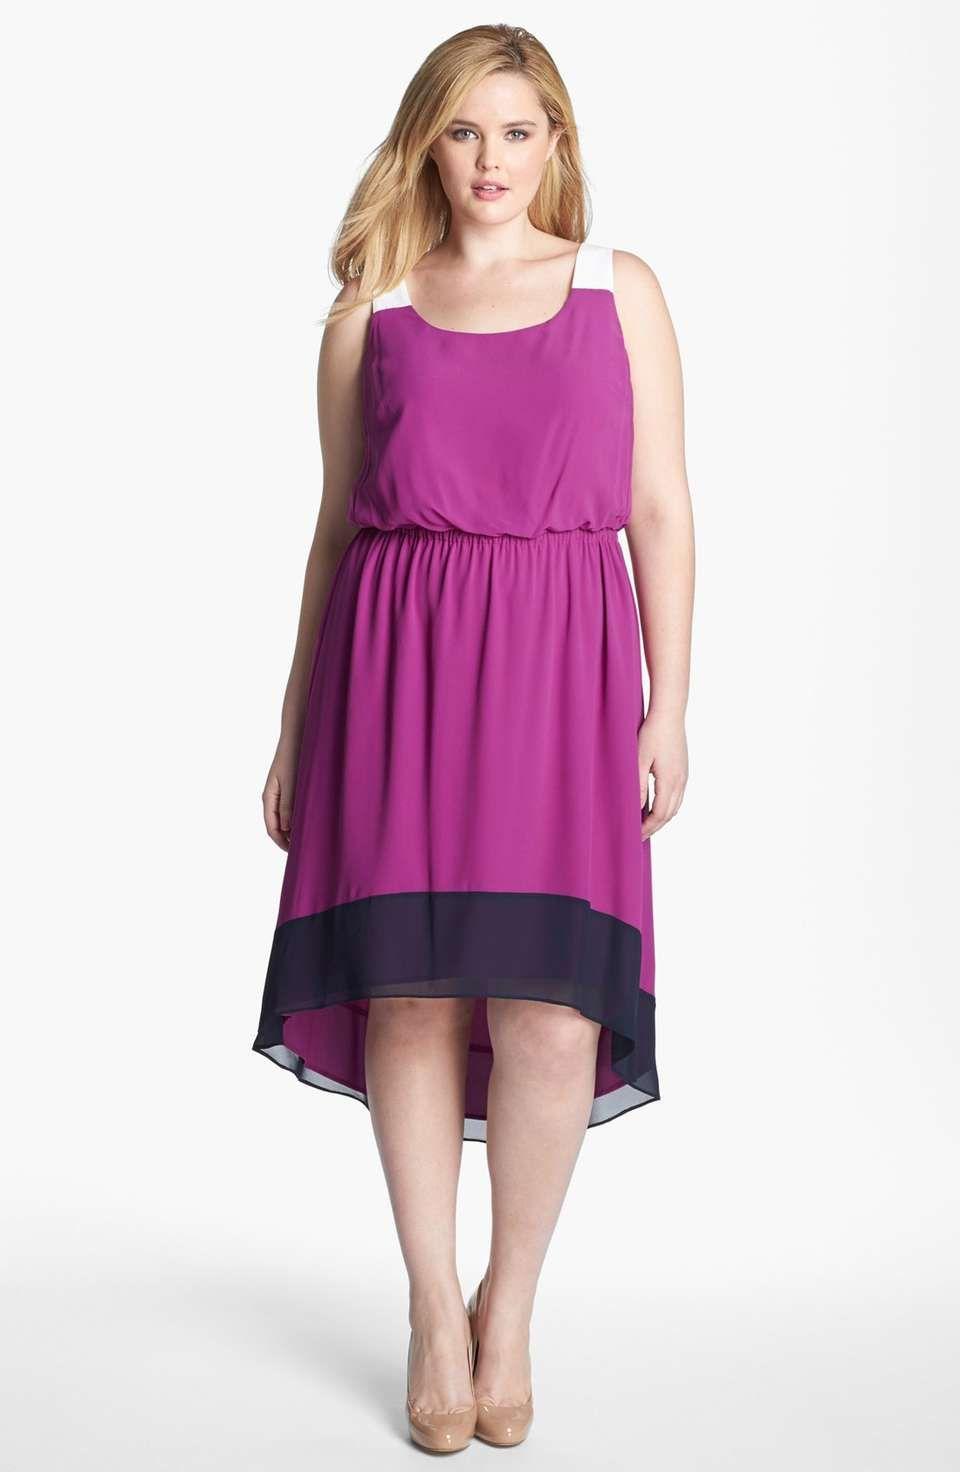 Jessica Simpson Colorblock Dress (Plus Size) | I is curvey | Pinterest